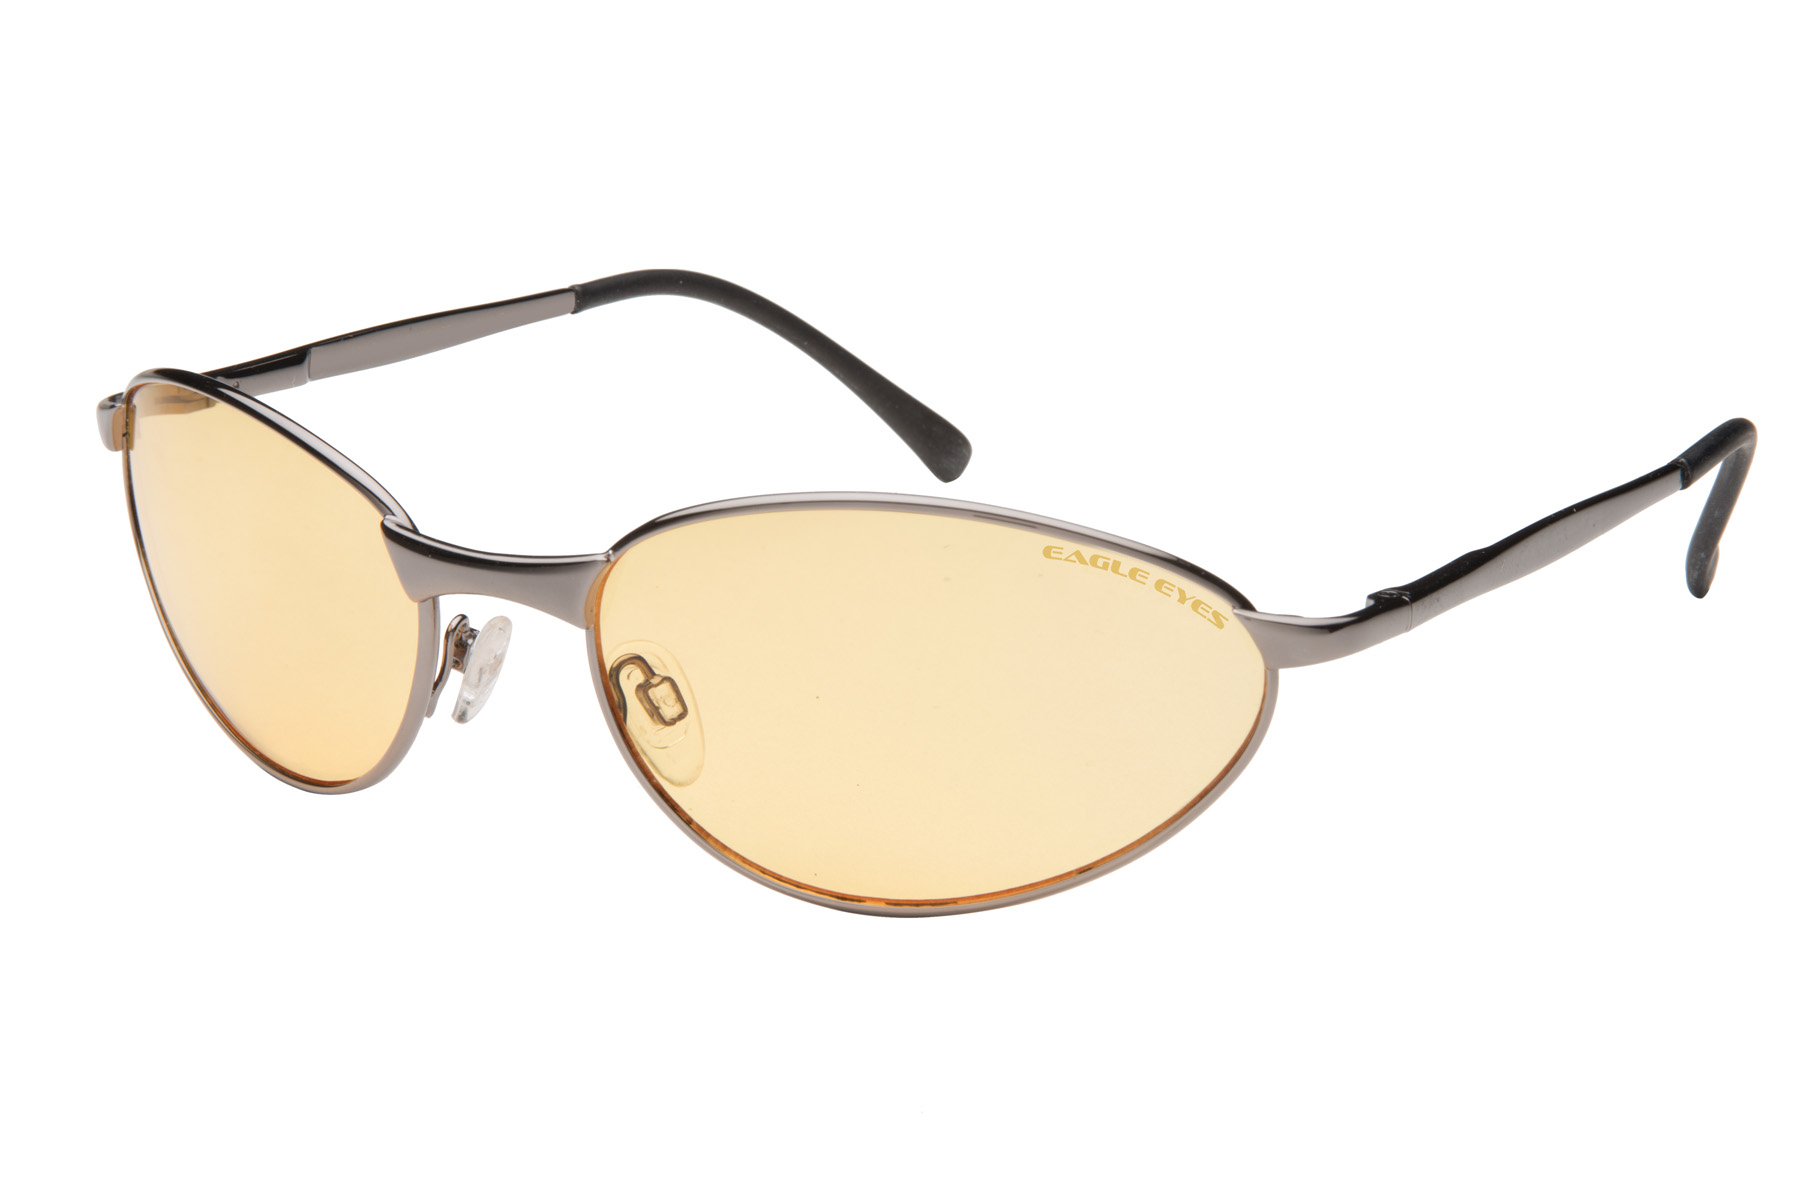 577f411732b9 Extreme Stimulight - SunTiger Elton Optics